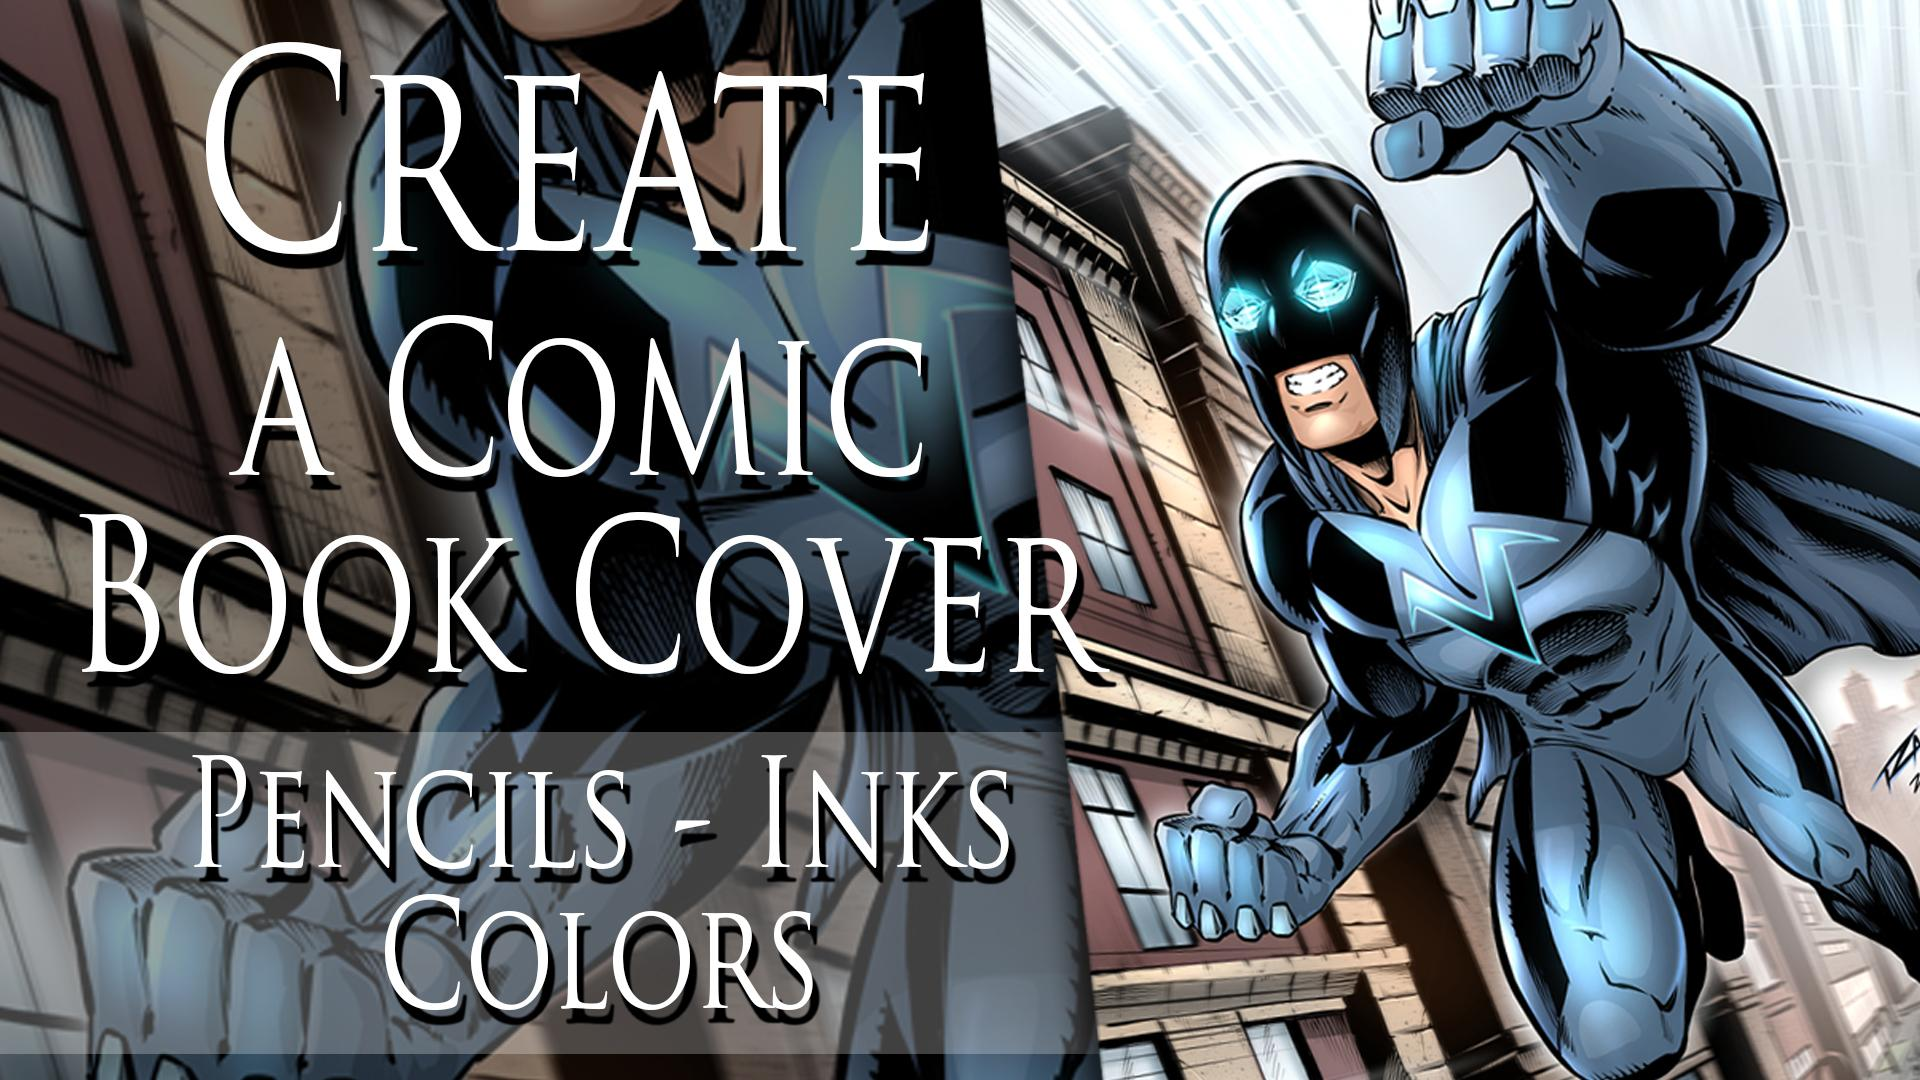 How To Draw Superheroes Creating Comic Book Cover Art Robert Marzullo Skillshare